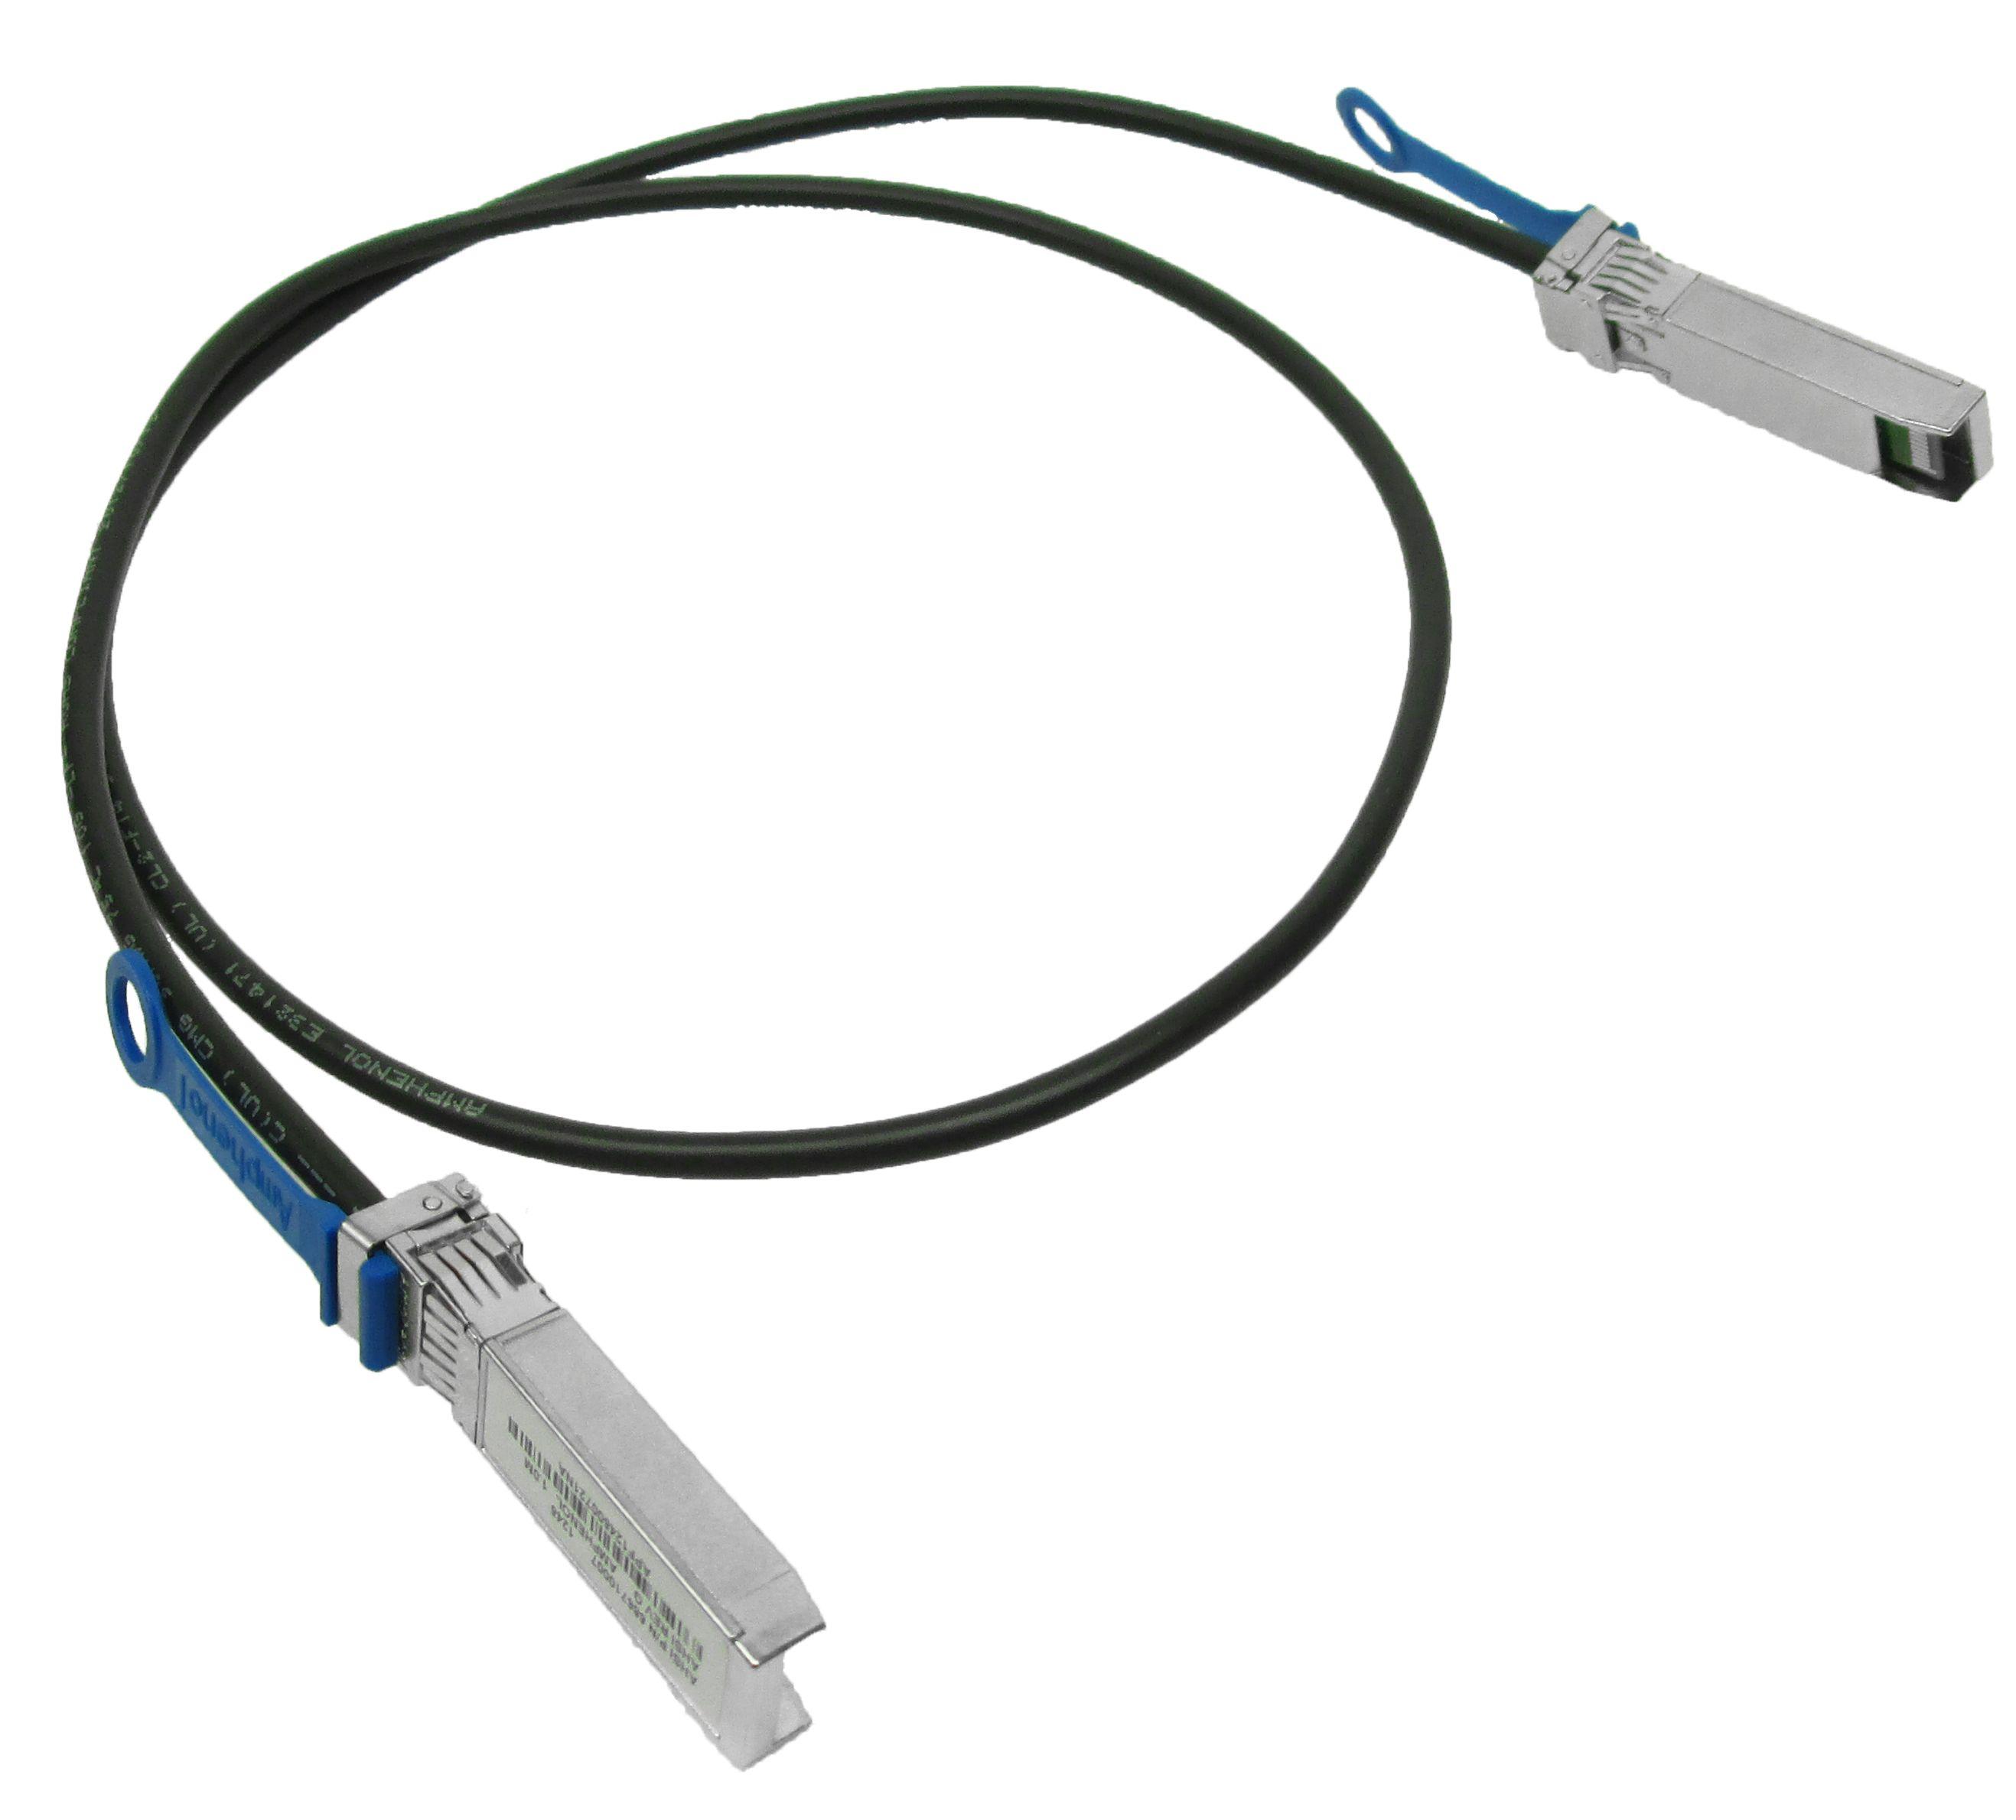 SFP+ DAC 10GBASE-CR 1m, Juniper Networks compatible EX-SFP-10GE-DAC-1M